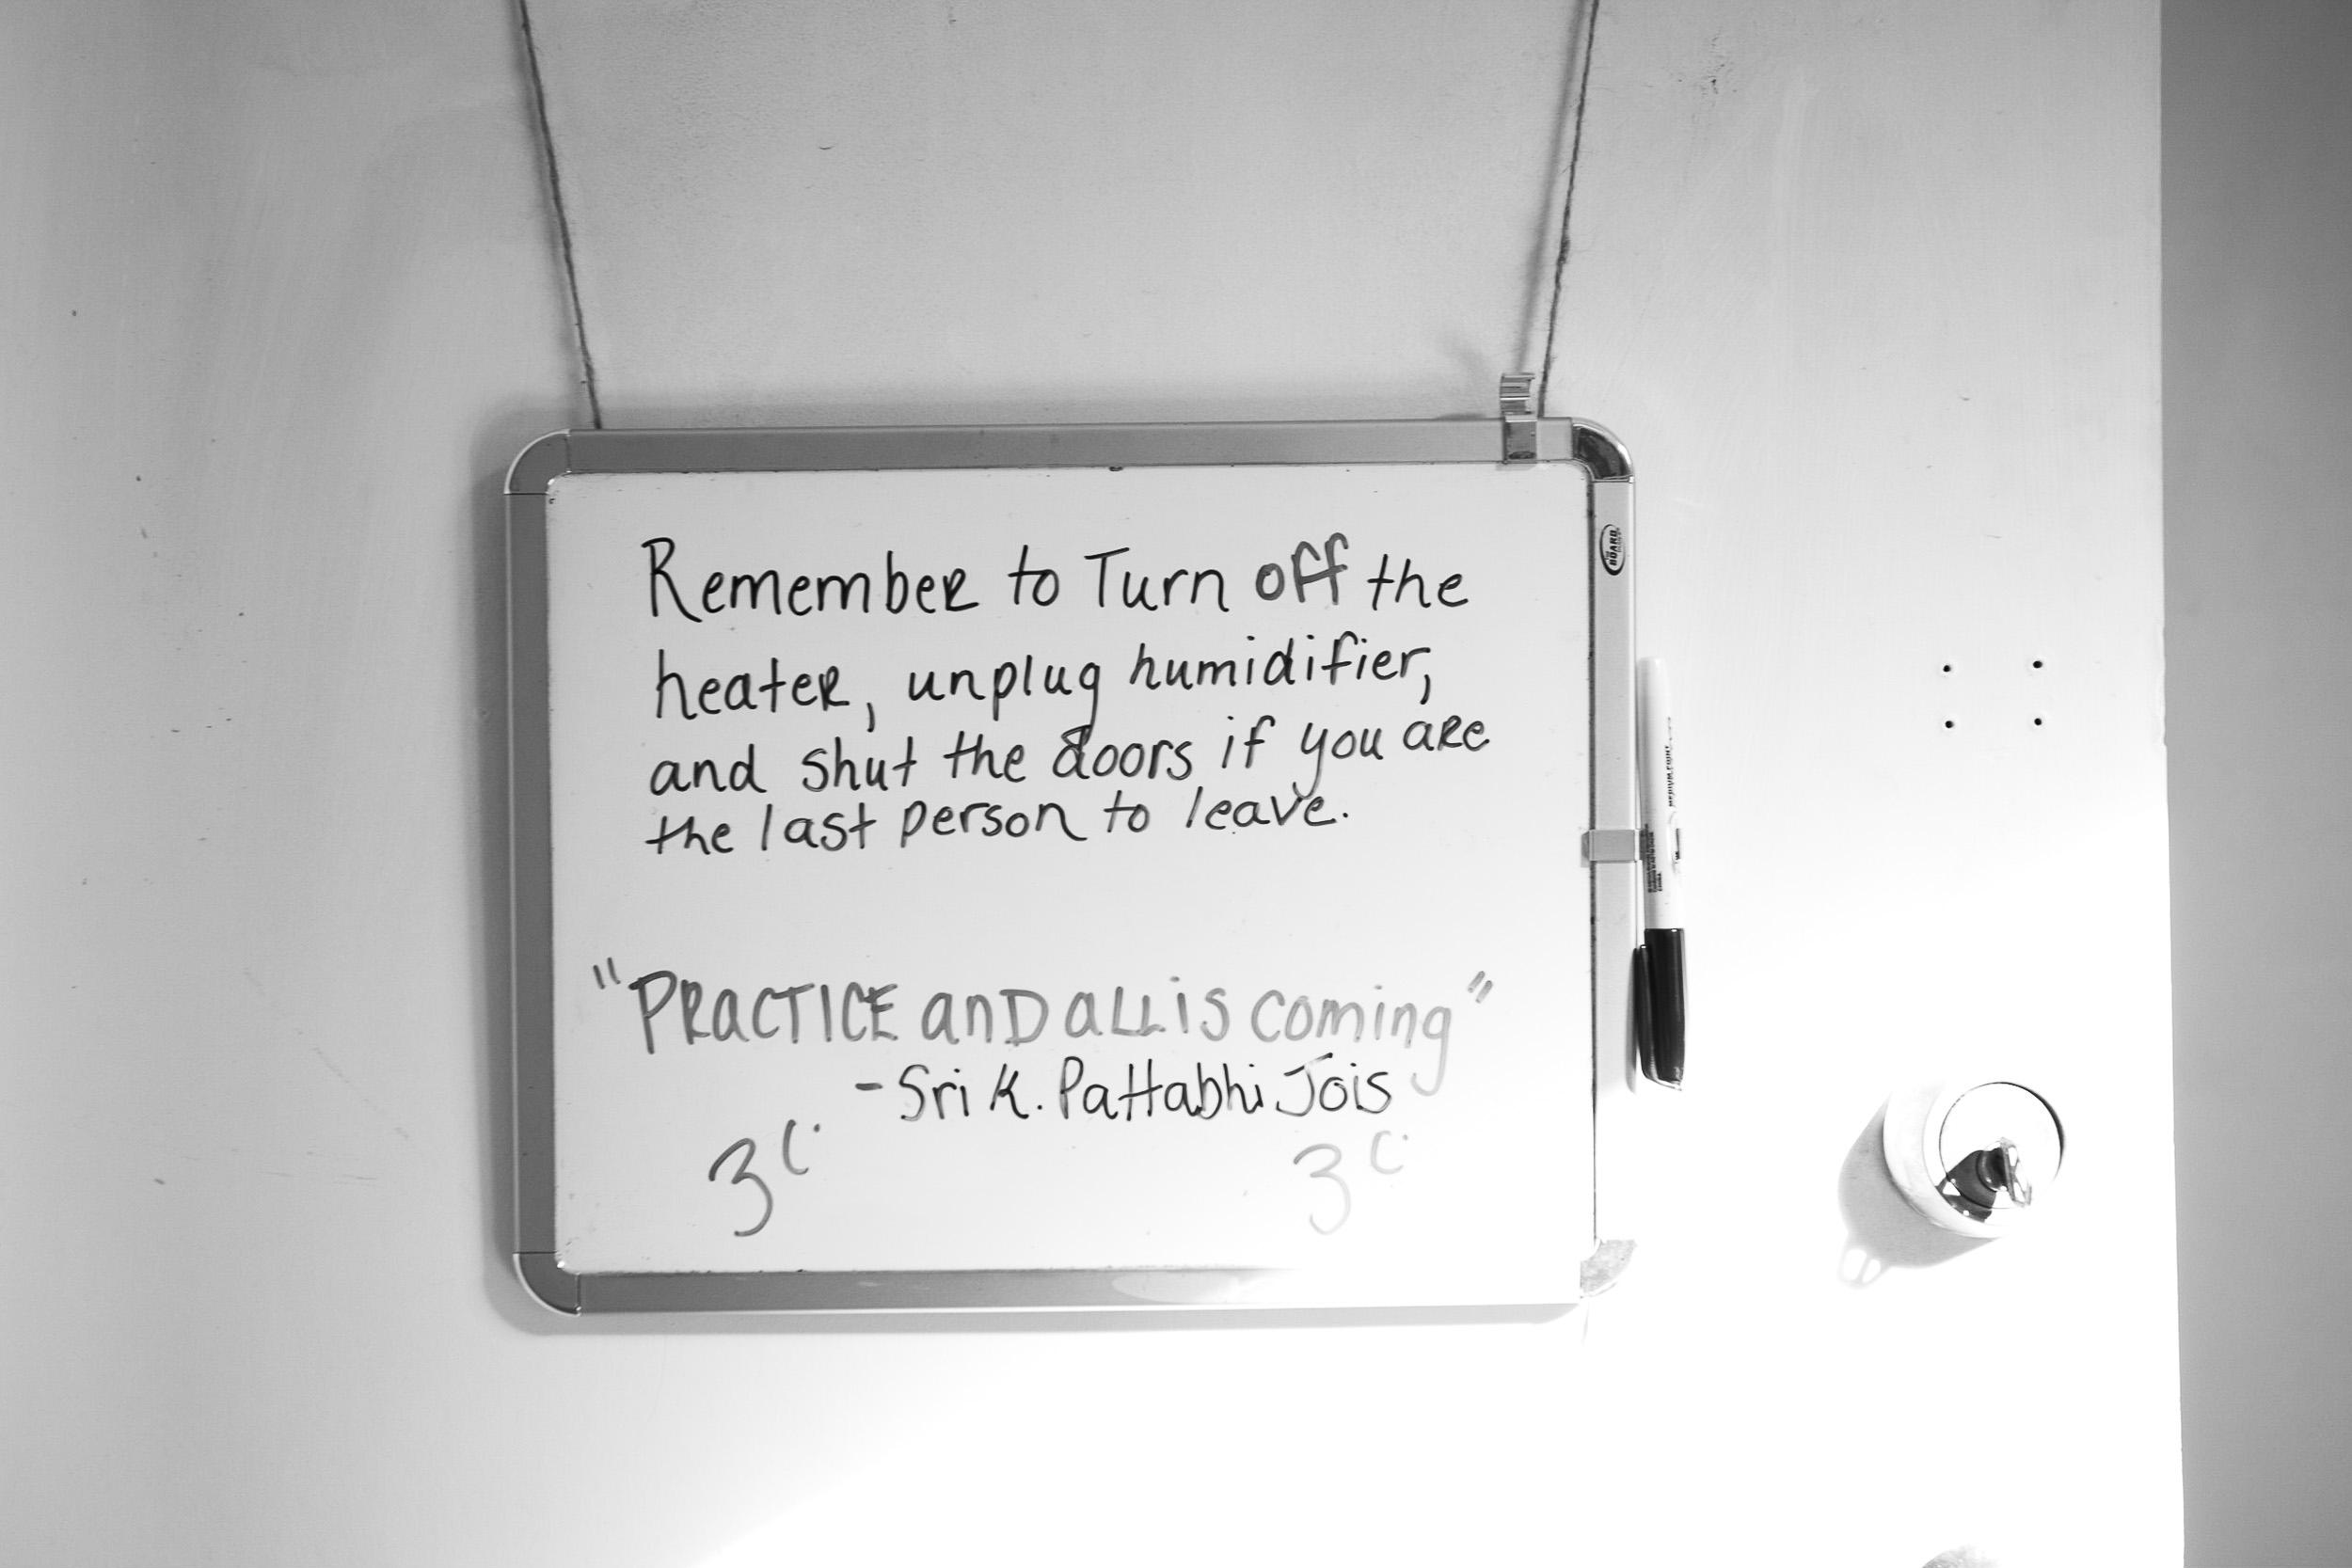 quote by the late master Guruji Sri K. Pattabhi Jois